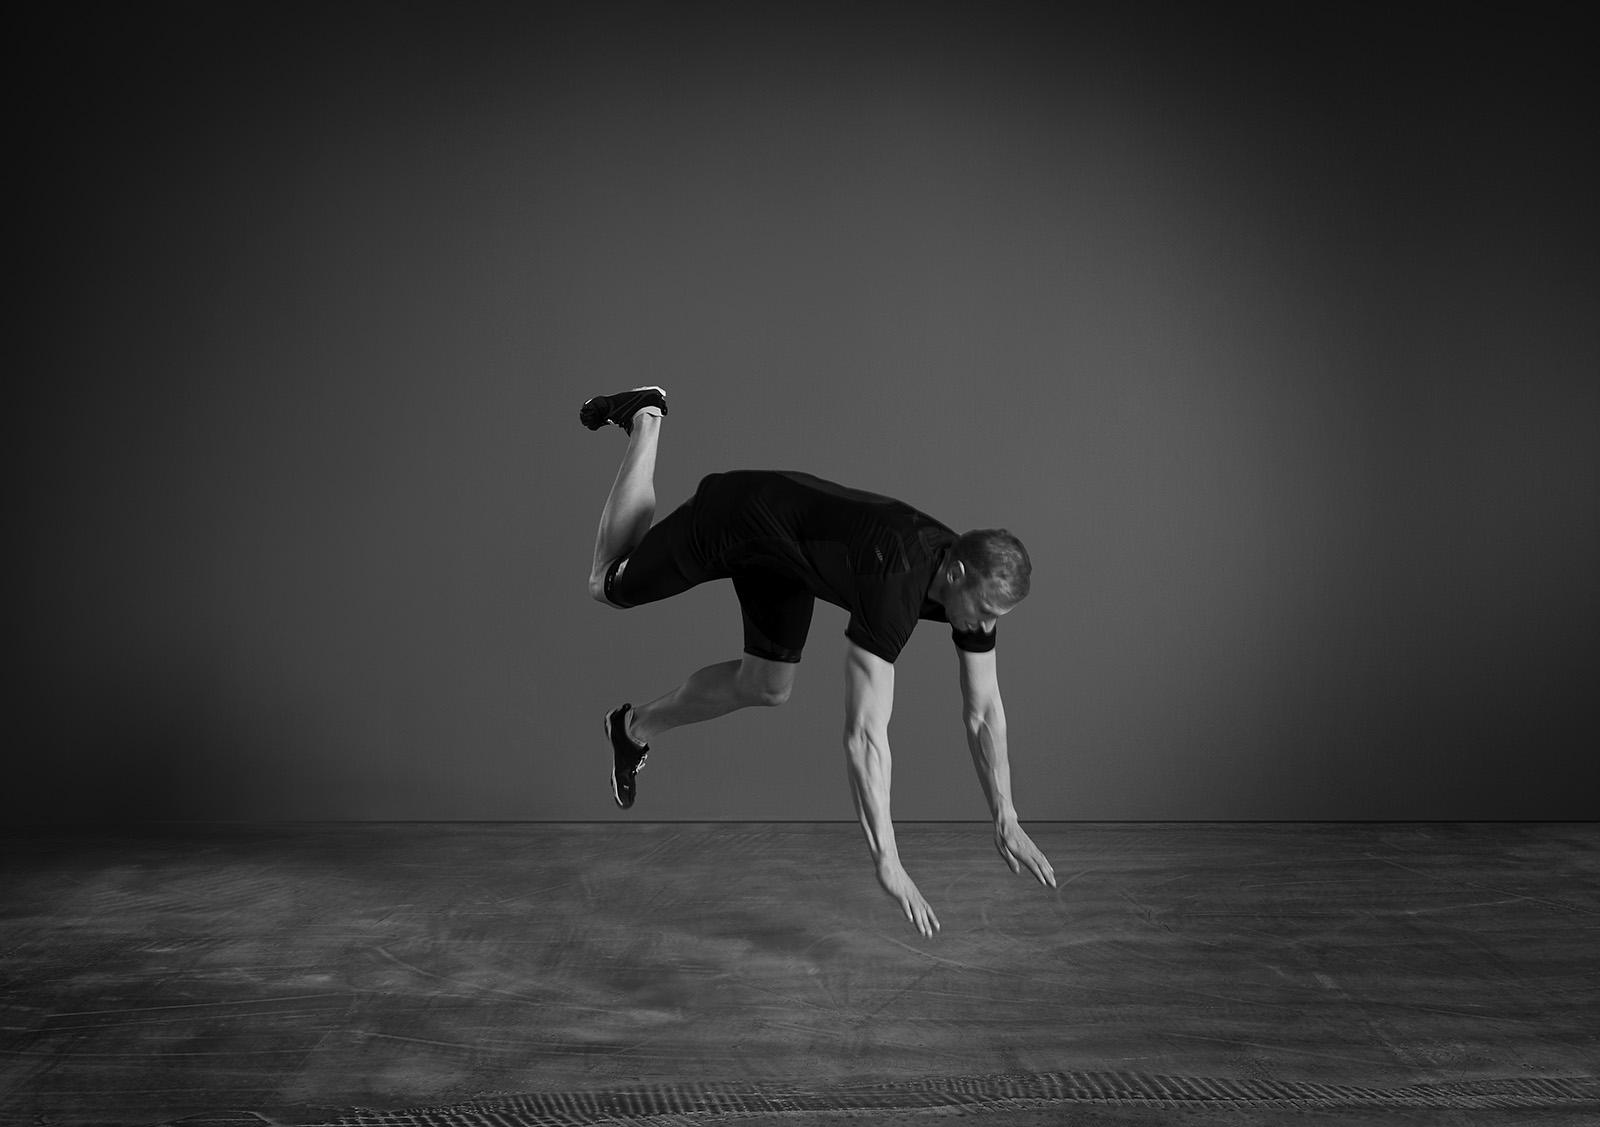 patrick-schreiber-Personal-Training-jump-4er